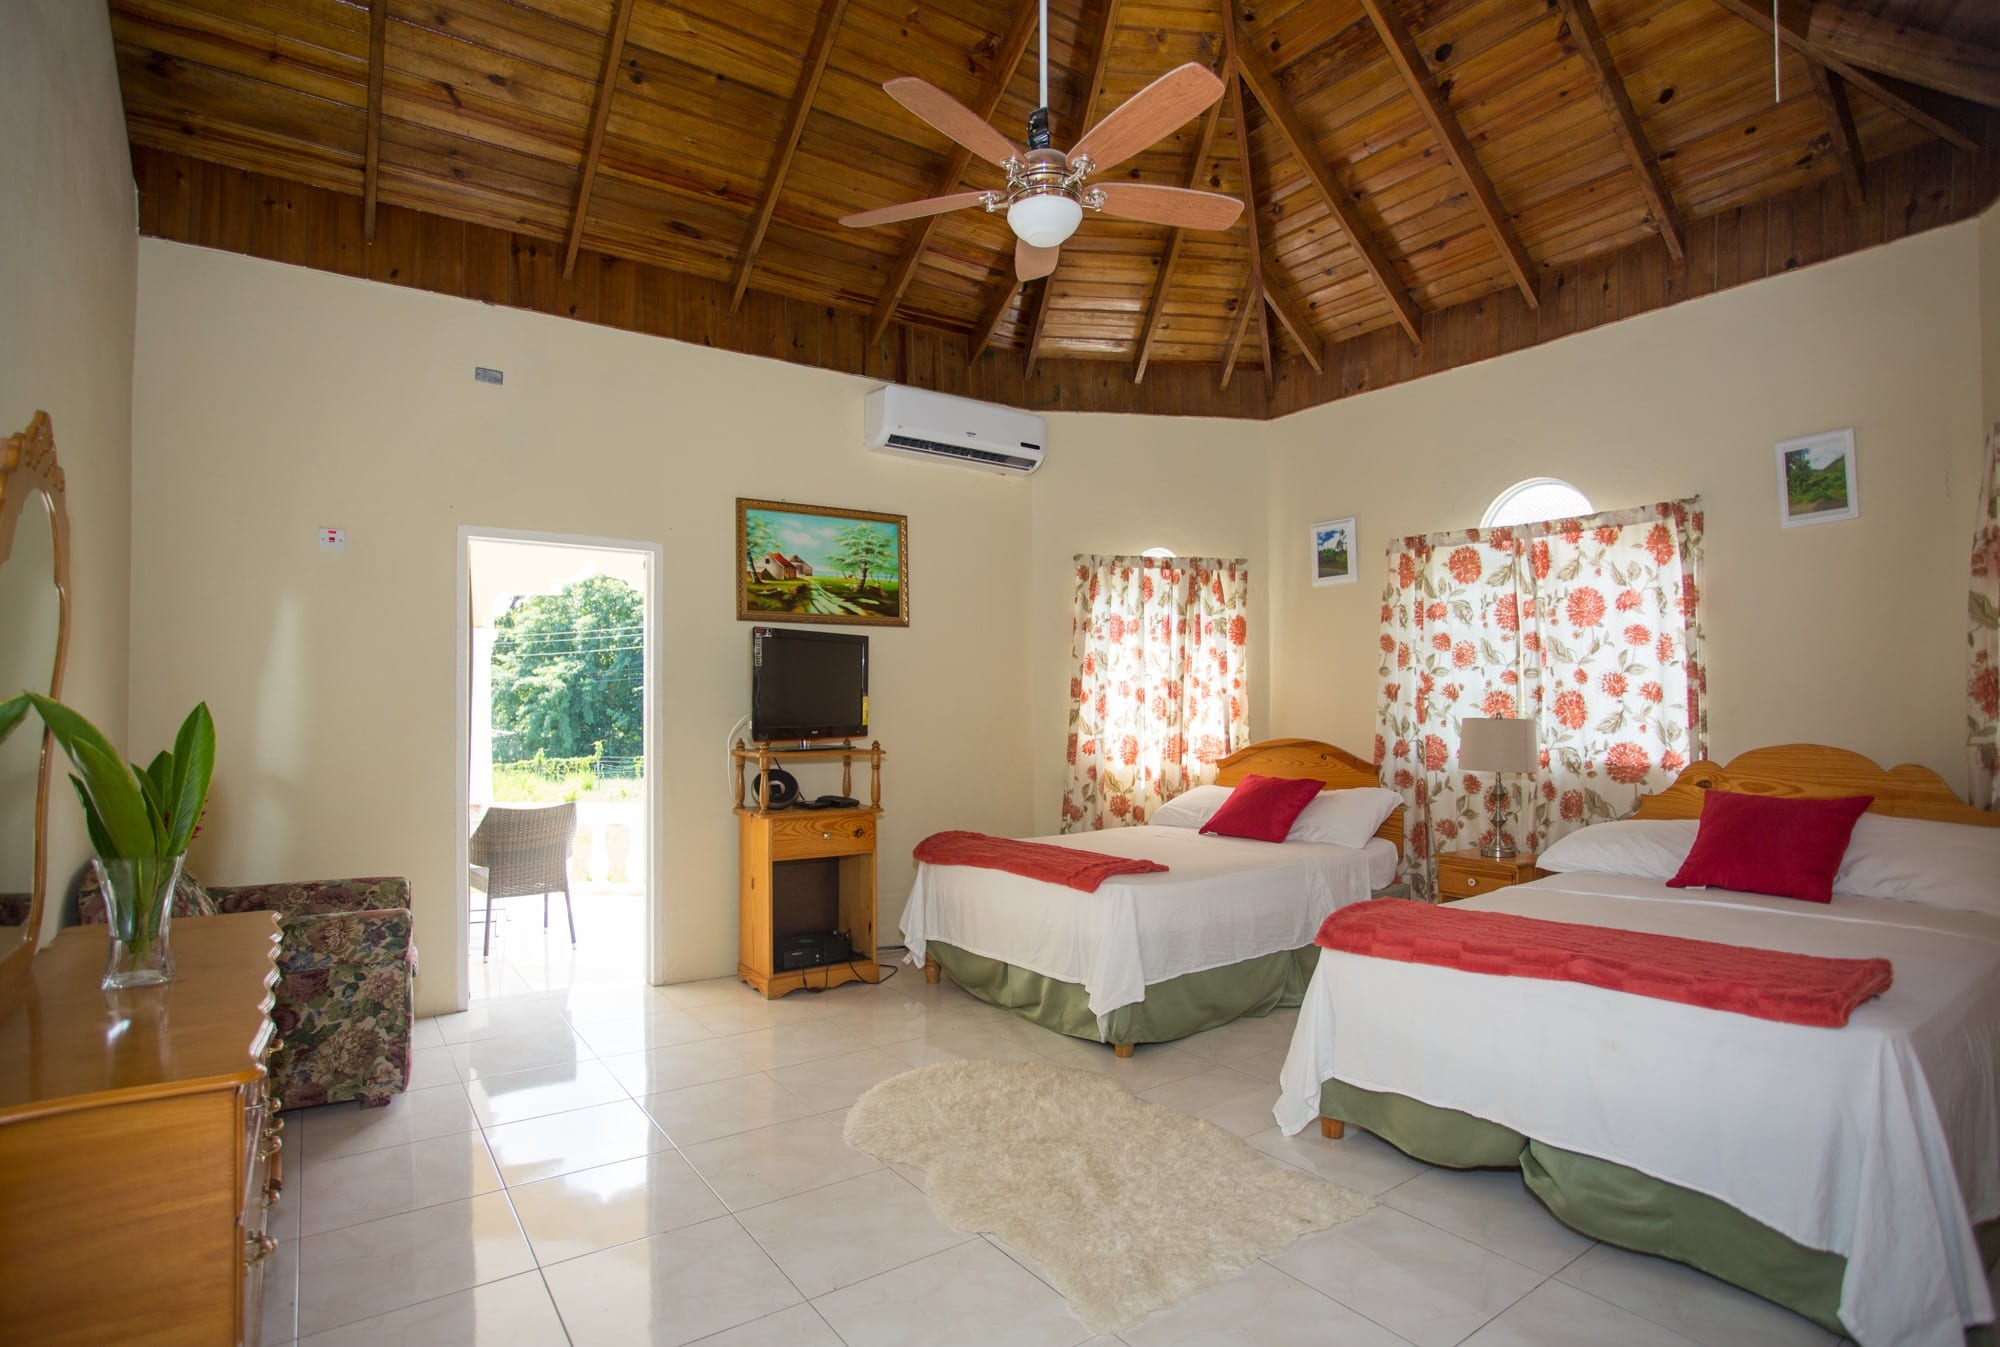 Jamaica villa bedroom sleeps 4